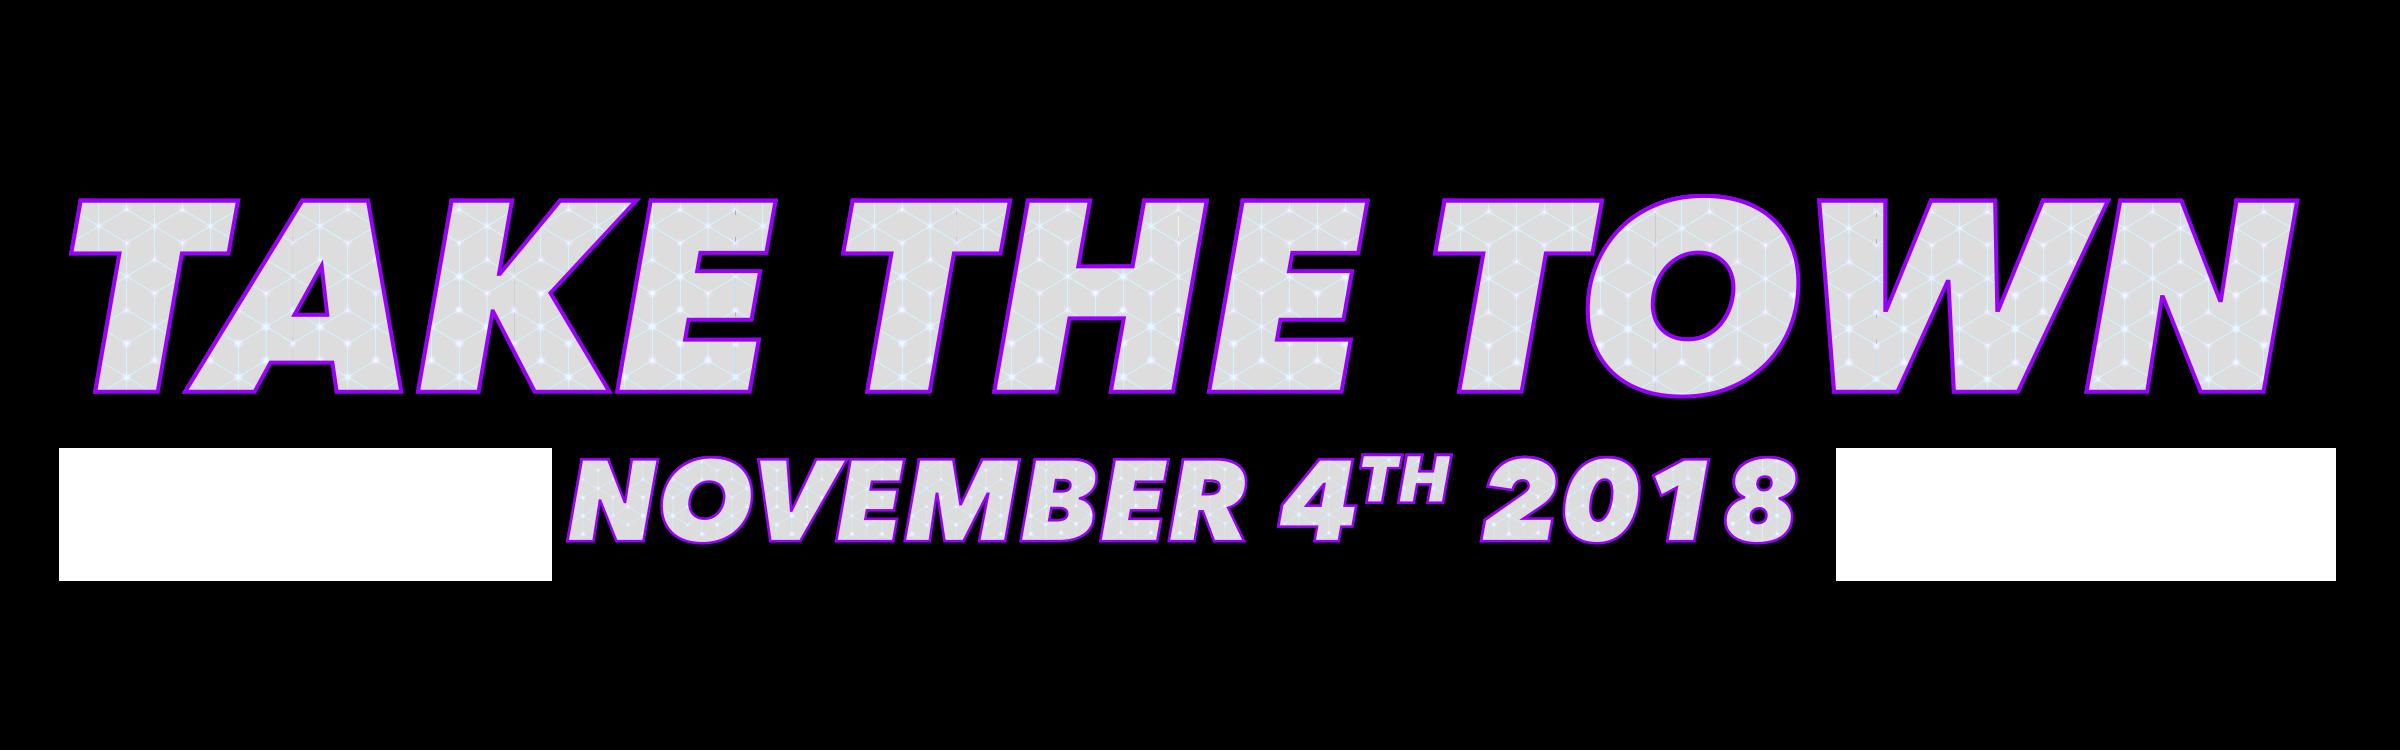 Take the Town 2018